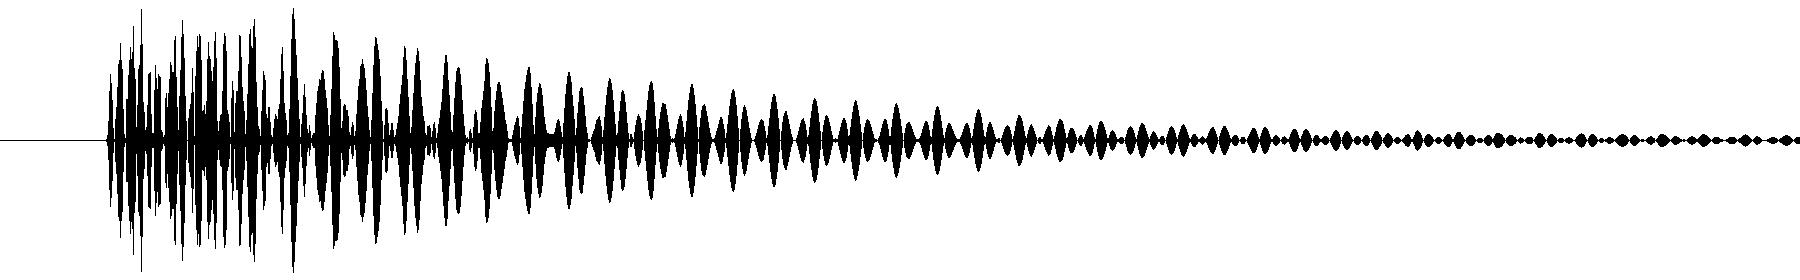 perc 1 38